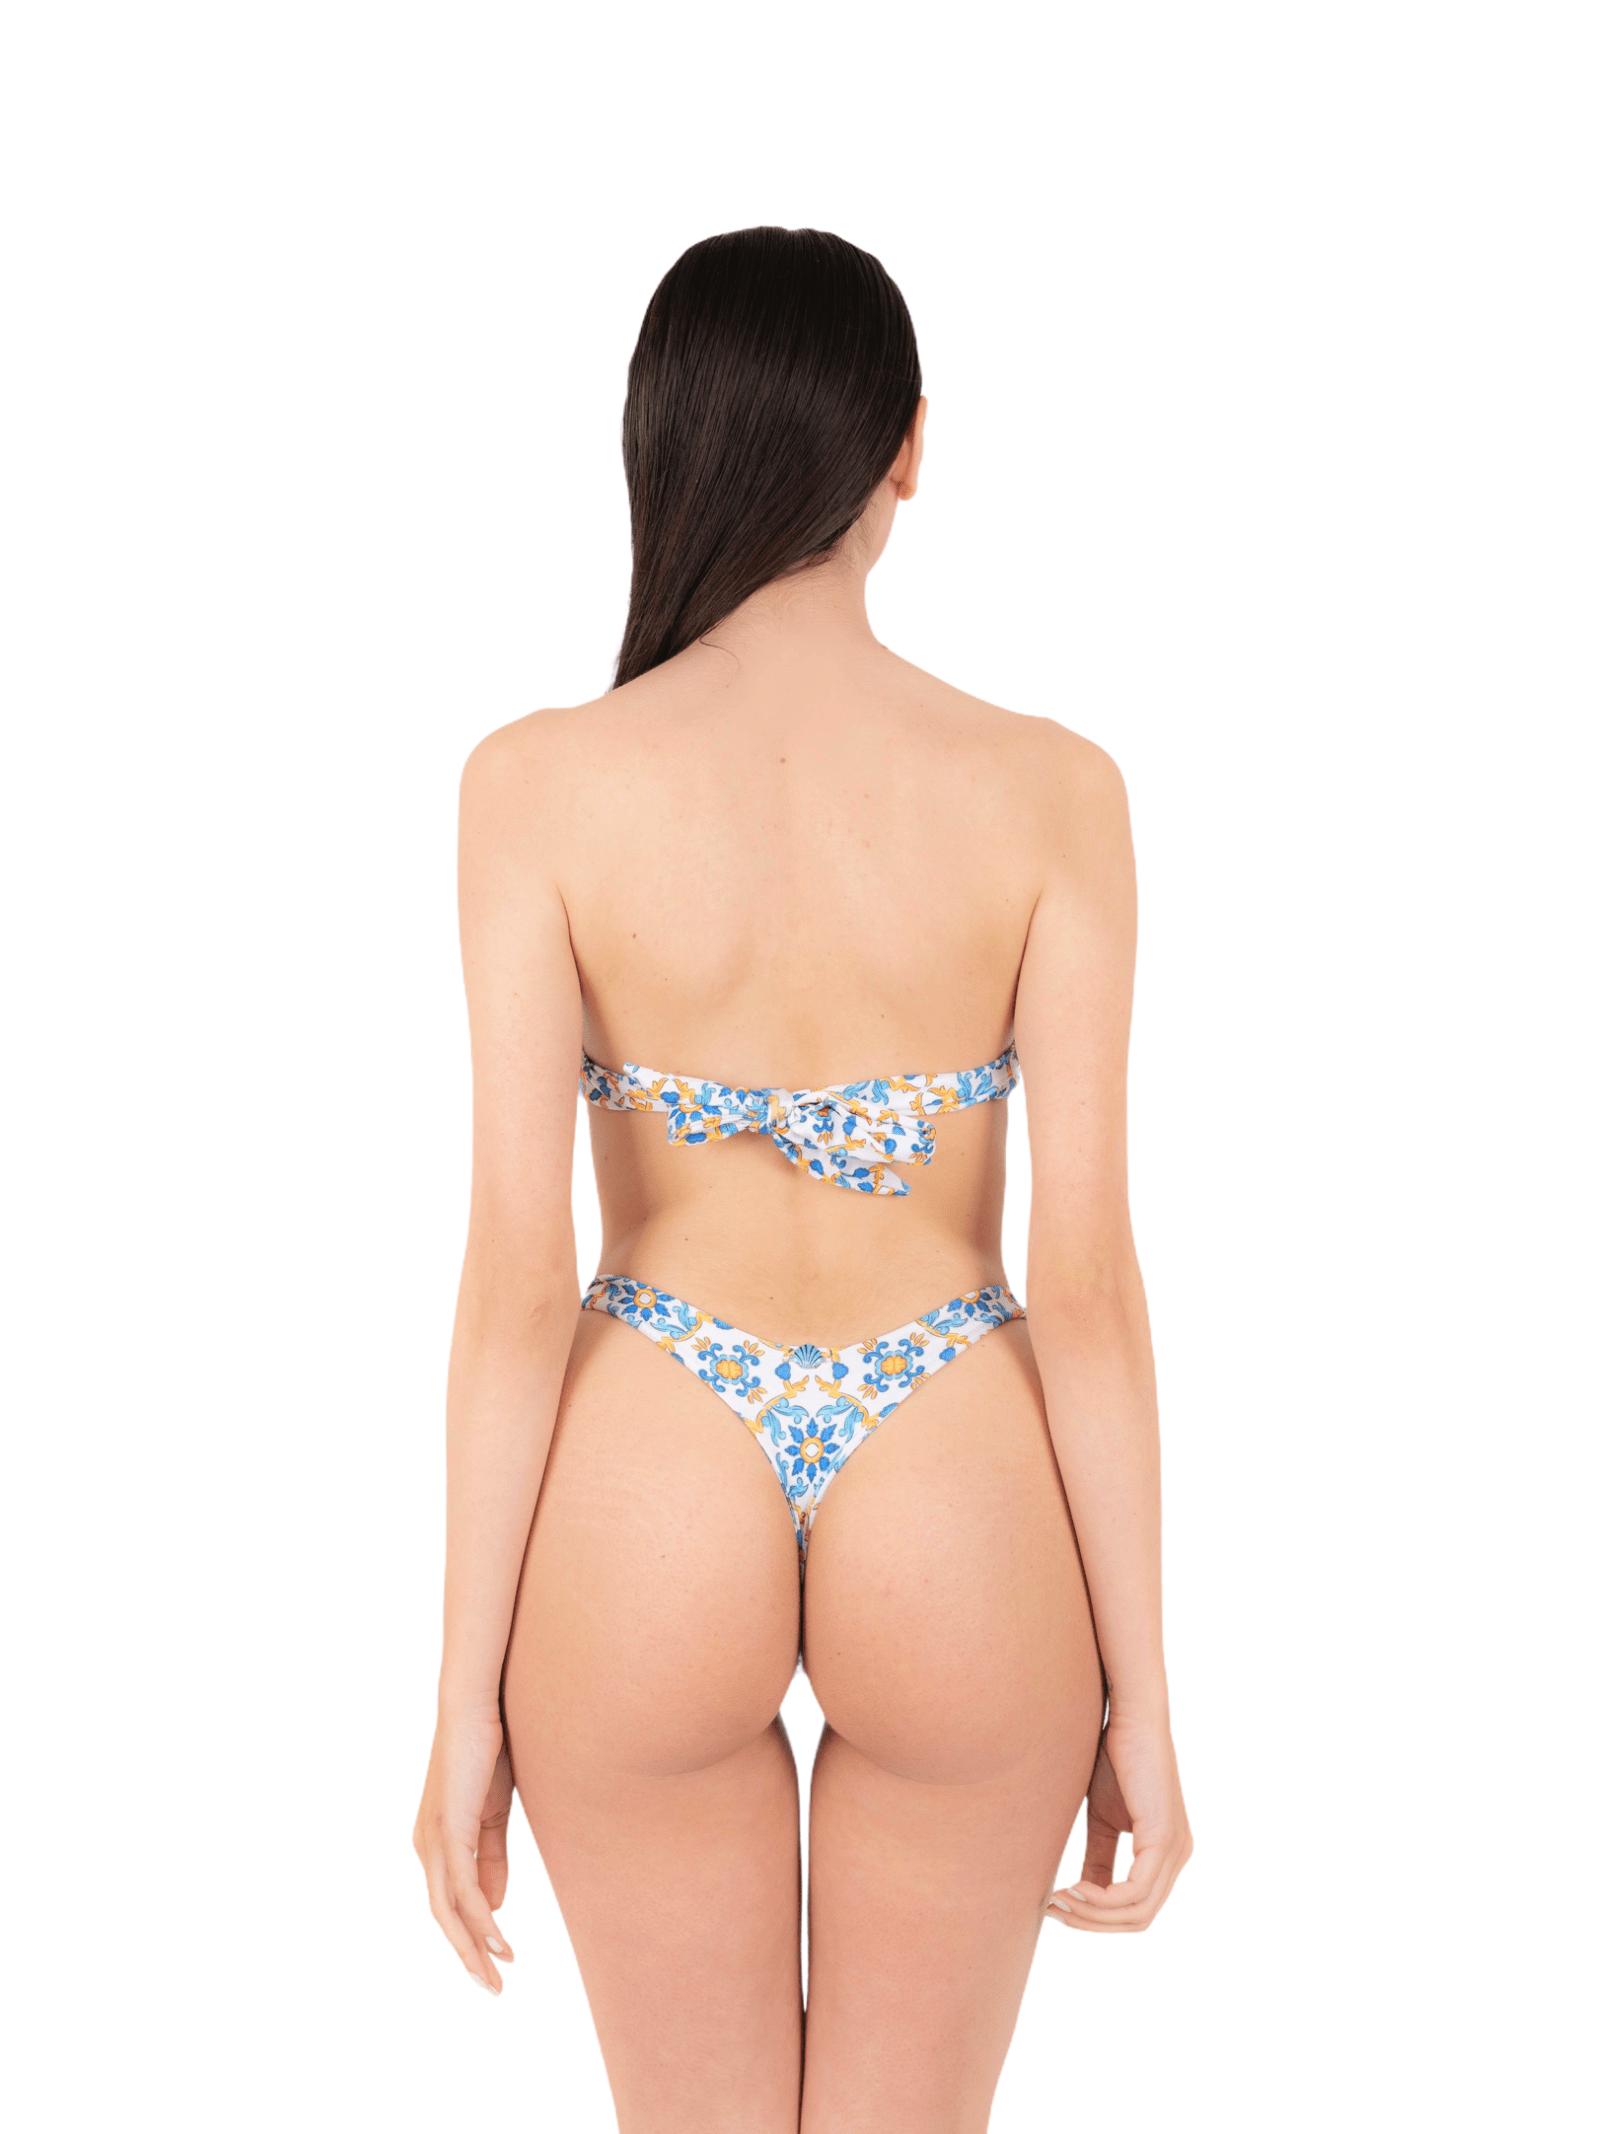 Bikini top shell with thong ANNAMARE | 23 | BK-120BIANCO